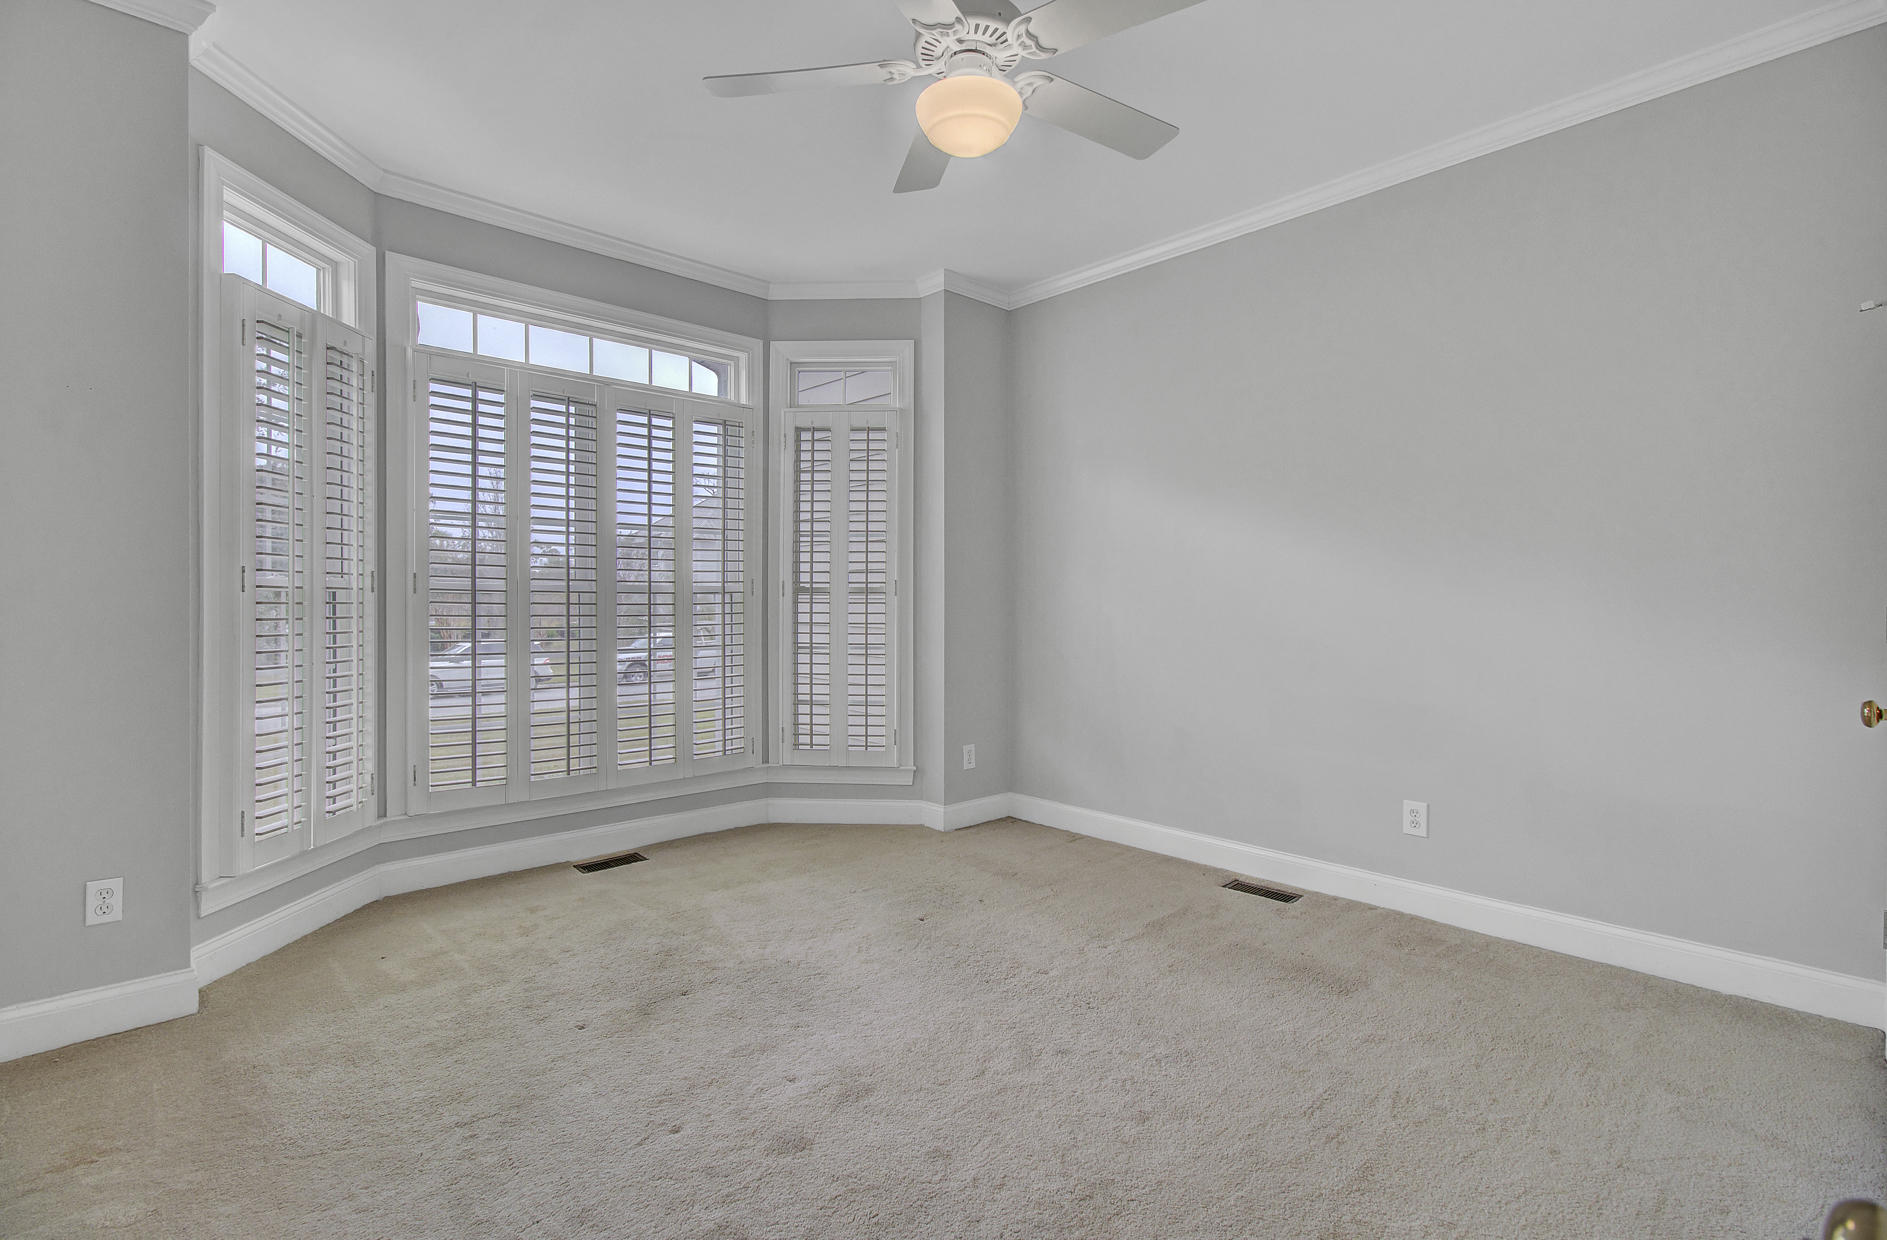 Dunes West Homes For Sale - 2321 Darts Cove, Mount Pleasant, SC - 4